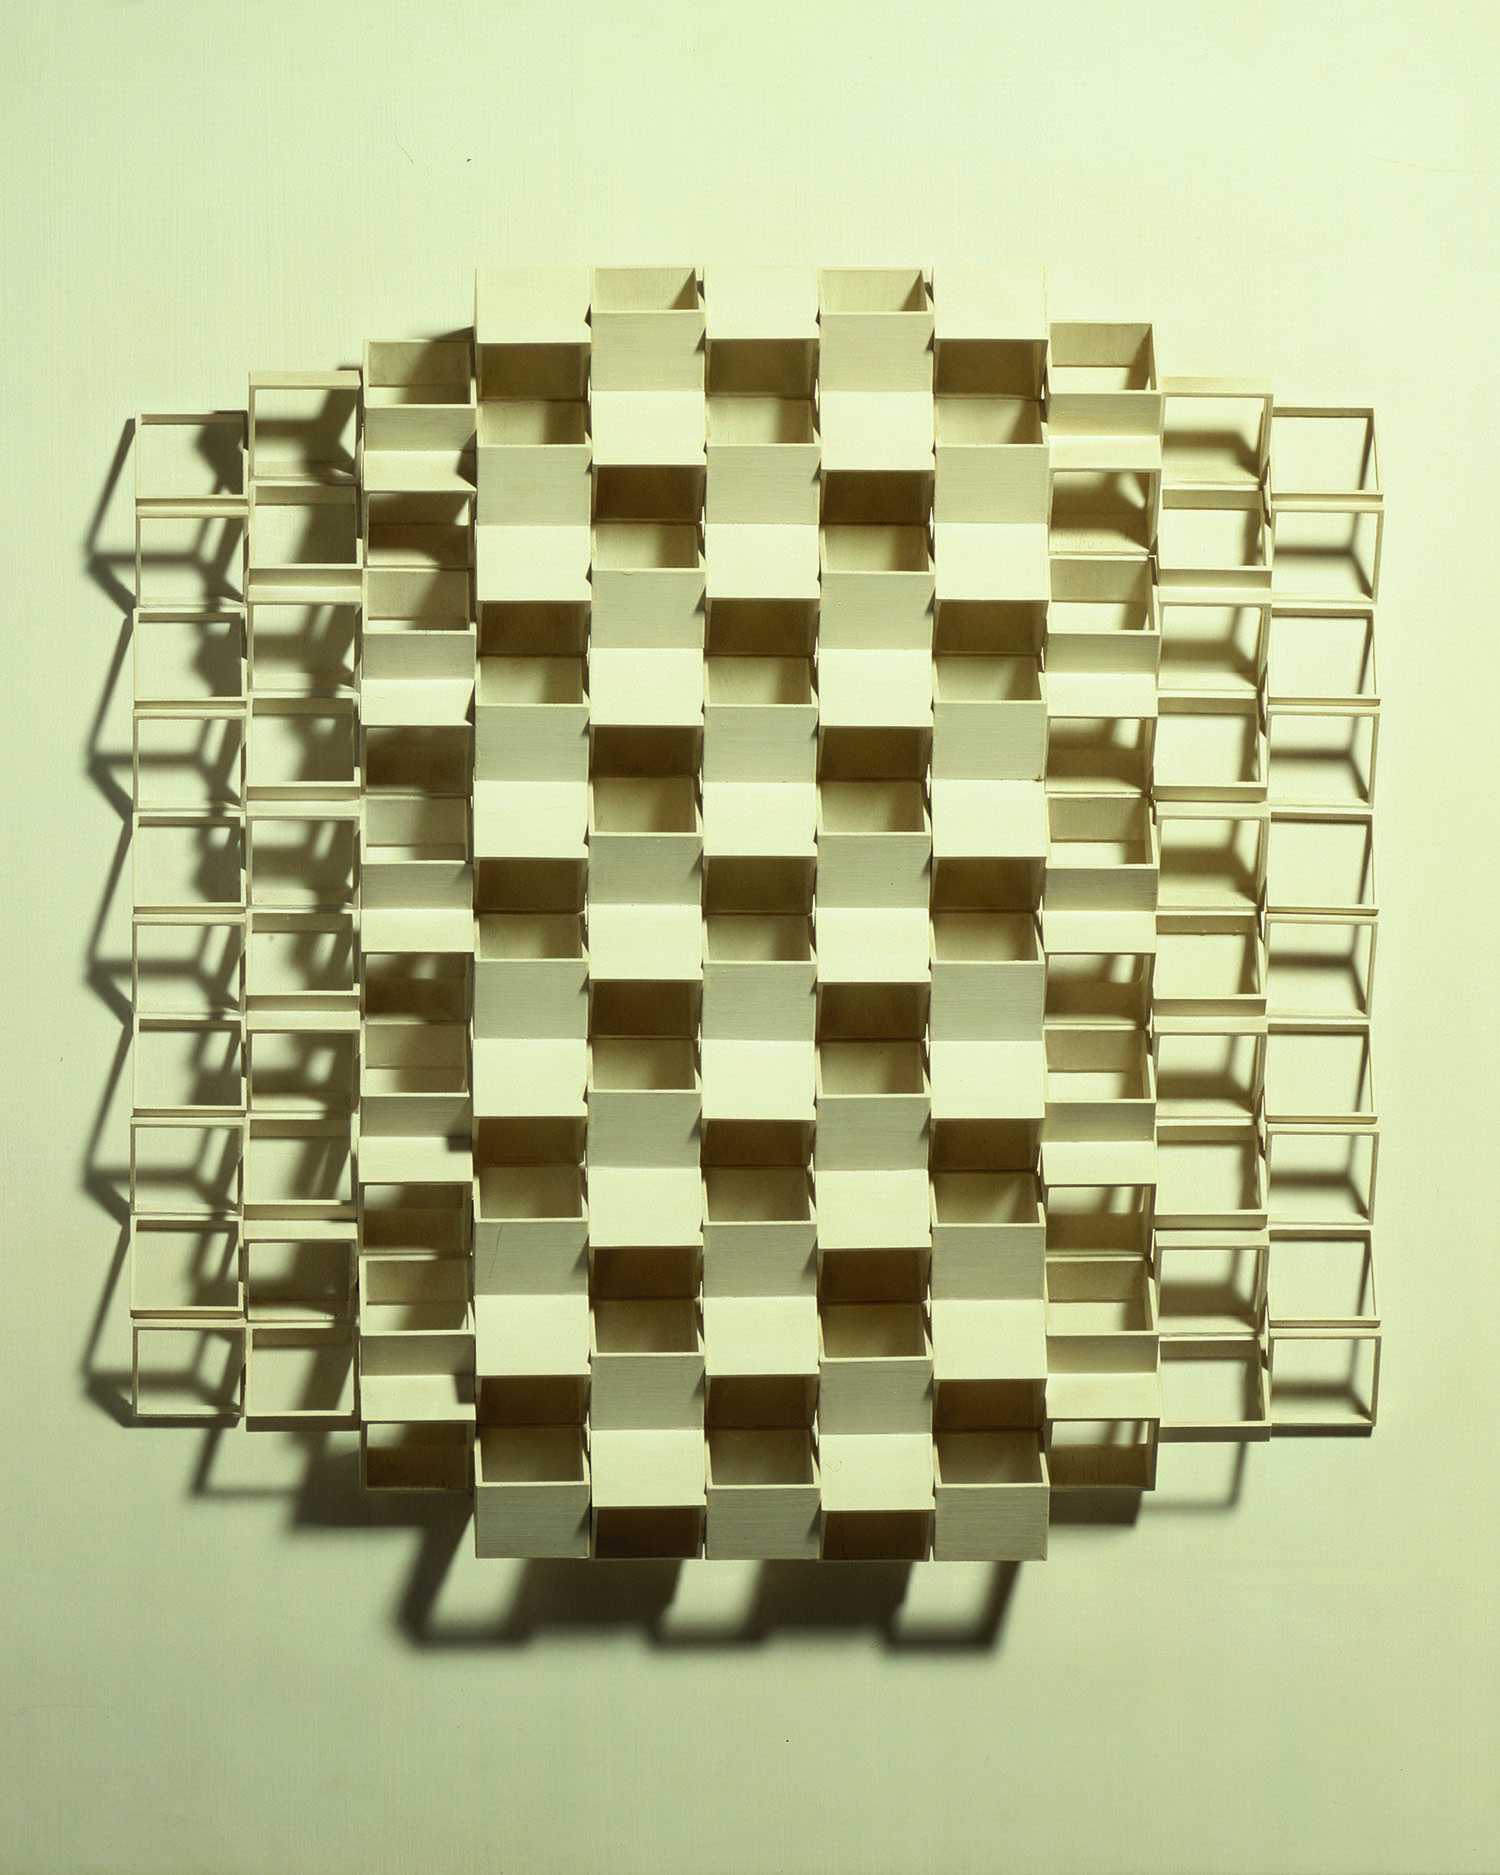 Composición Geomètrica. Josep Navarro Vives. 1971, Tecnica mixta sobre tela, cm 70 x 70..